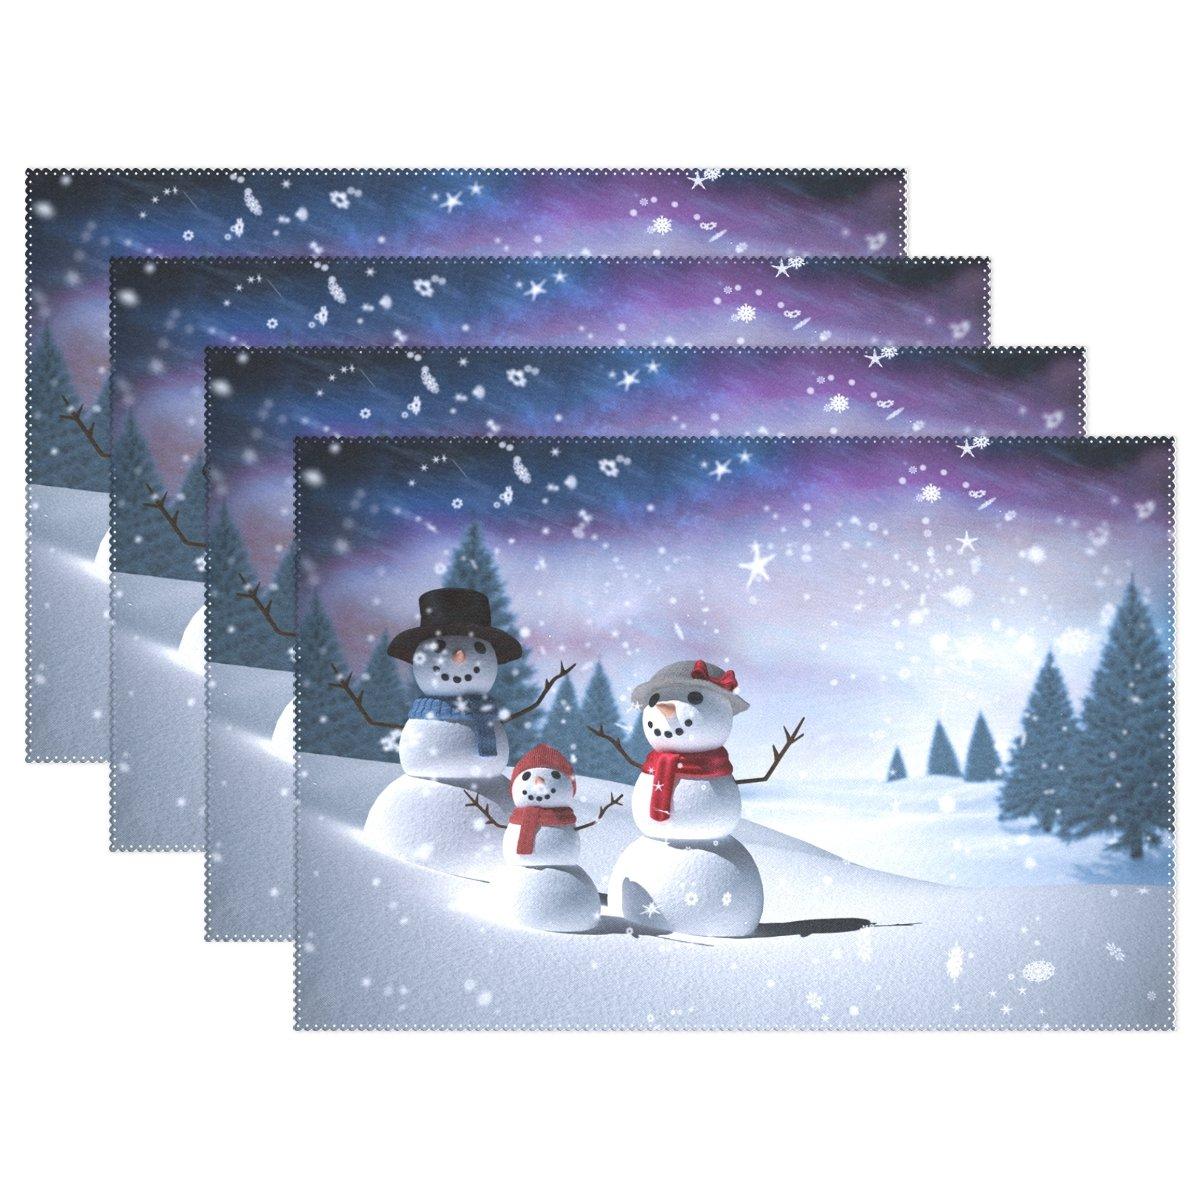 Alazaクリスマス雪だるまツリー12 x 18インチプレースマット耐熱性ダイニングテーブルマットノンスリップ洗濯可能Placeマットホームキッチンの装飾 12 x 18 inch g1534333p145c160s252 6  B076S4KHGX